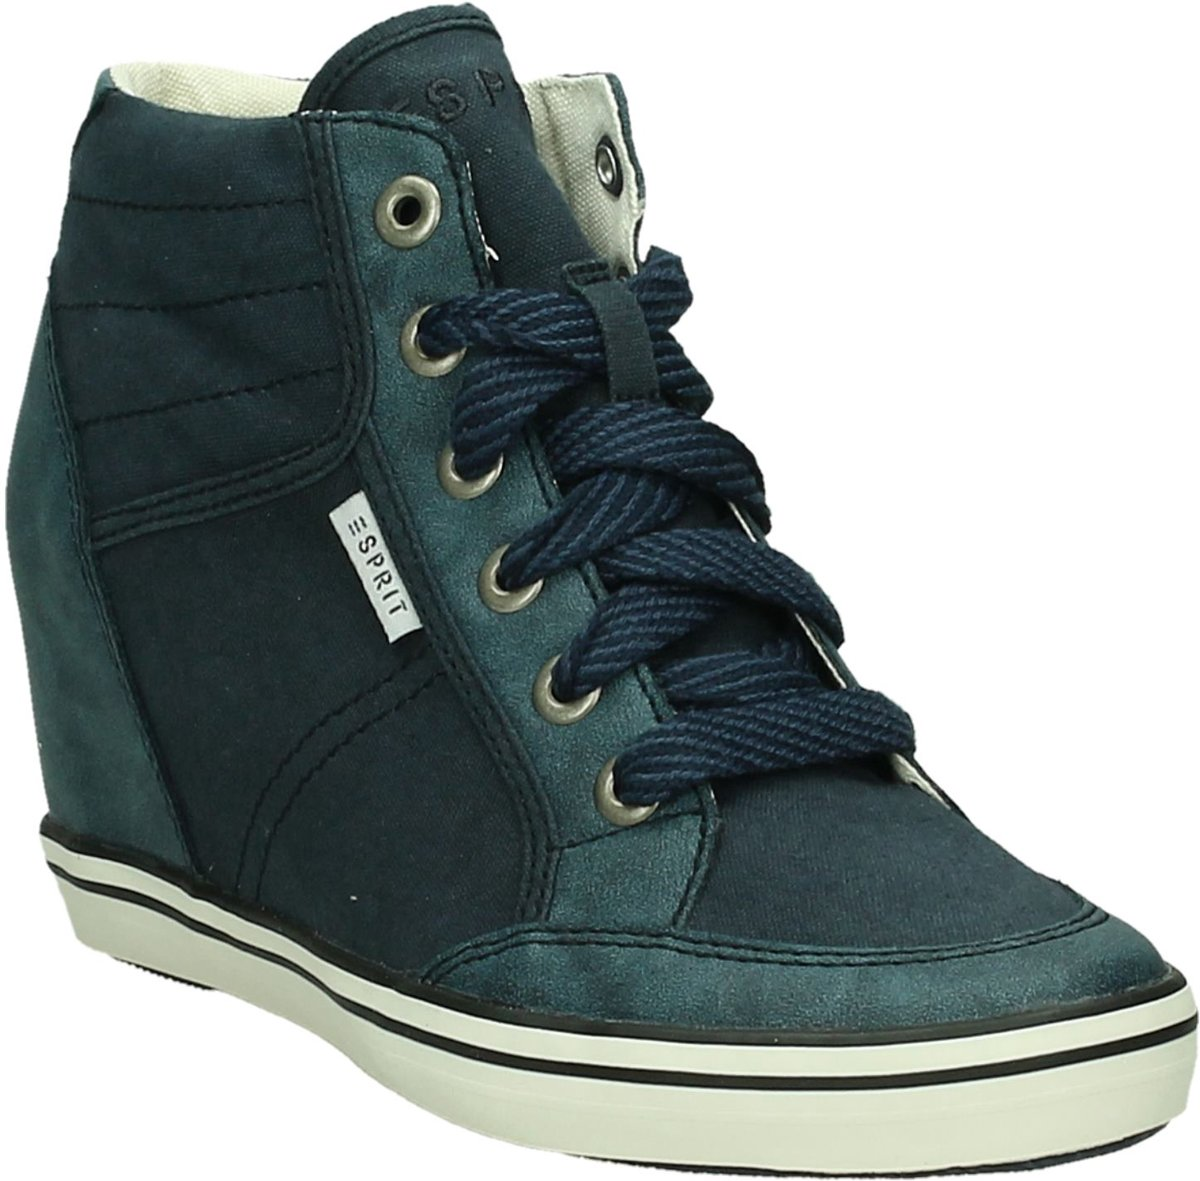 c6b86cc0d50 bol.com | Esprit - 036ek1w112 - Sneaker met sleehak - Dames - Maat 42 -  Blauw - Blue